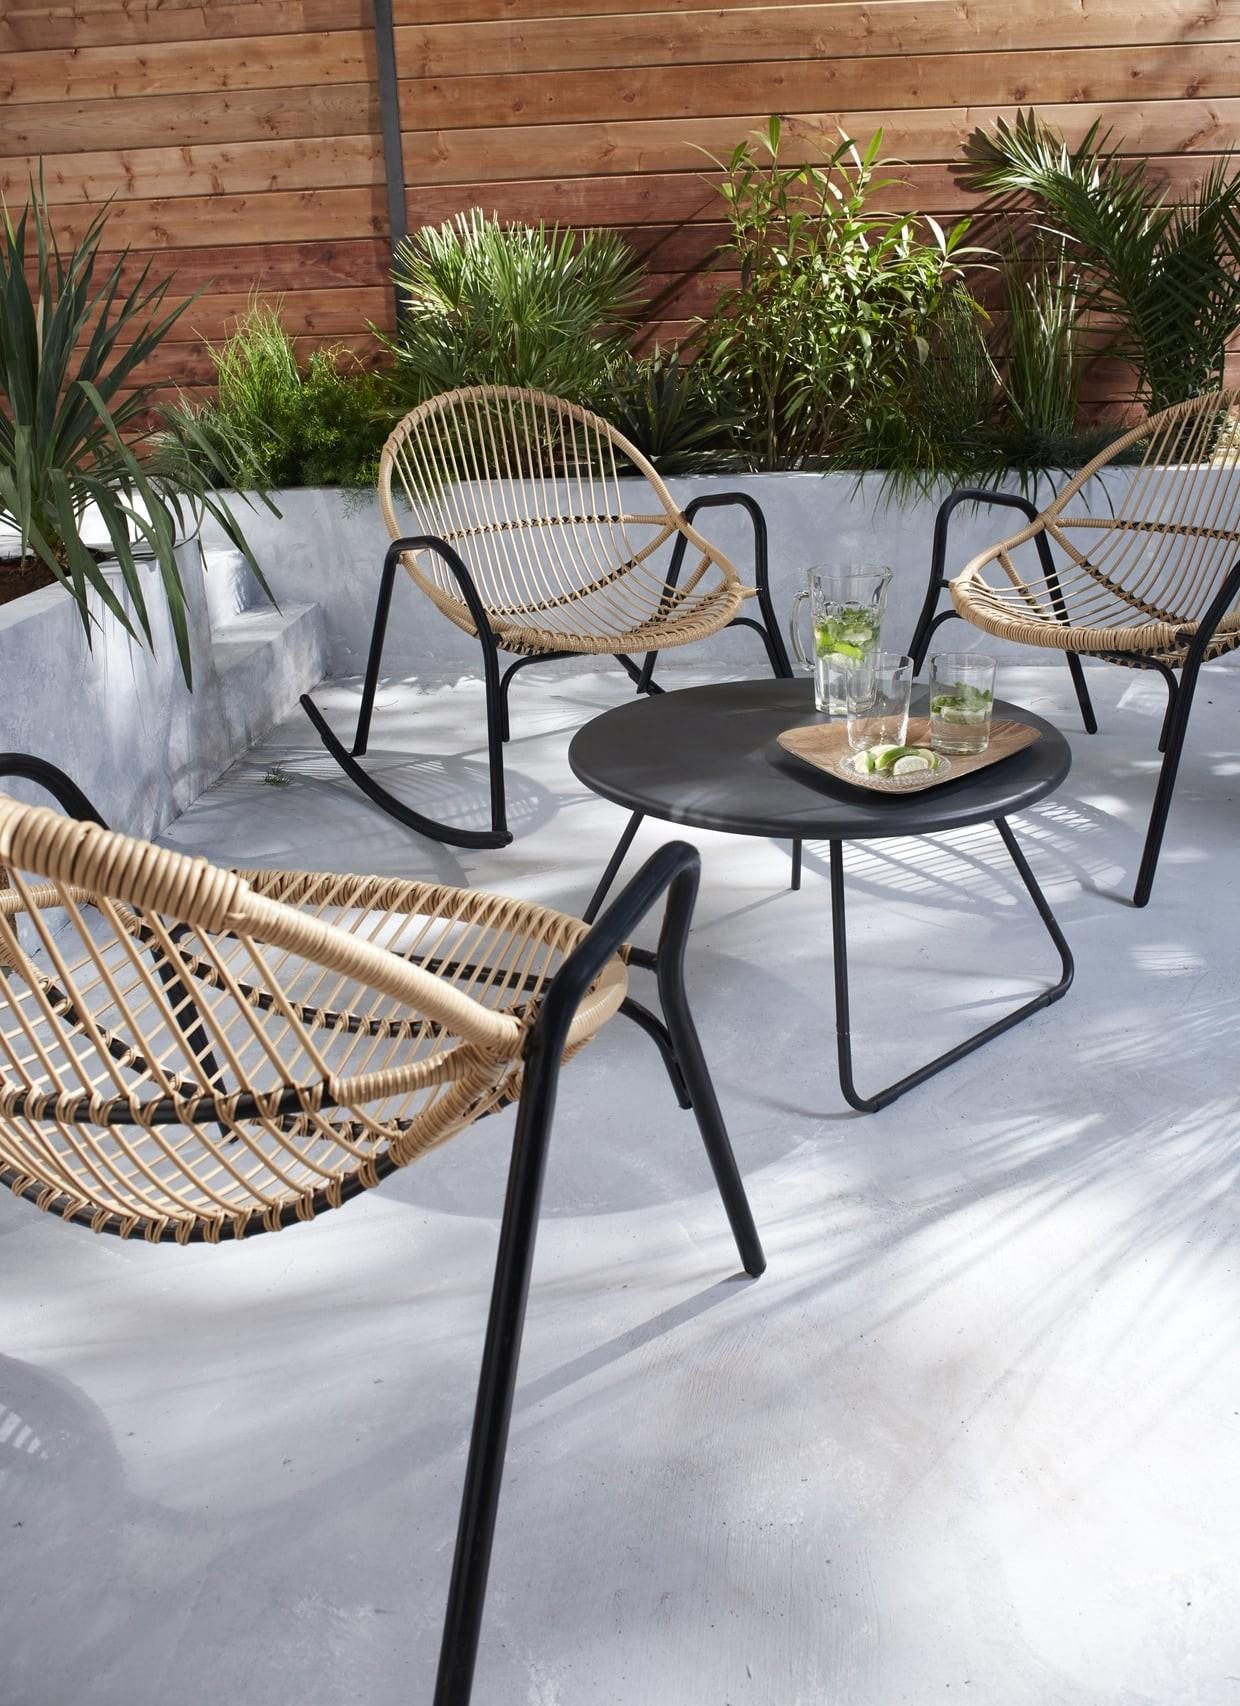 Salon De Jardin Kiwi Castorama - The Best Undercut Ponytail dedans Table De Jardin Castorama